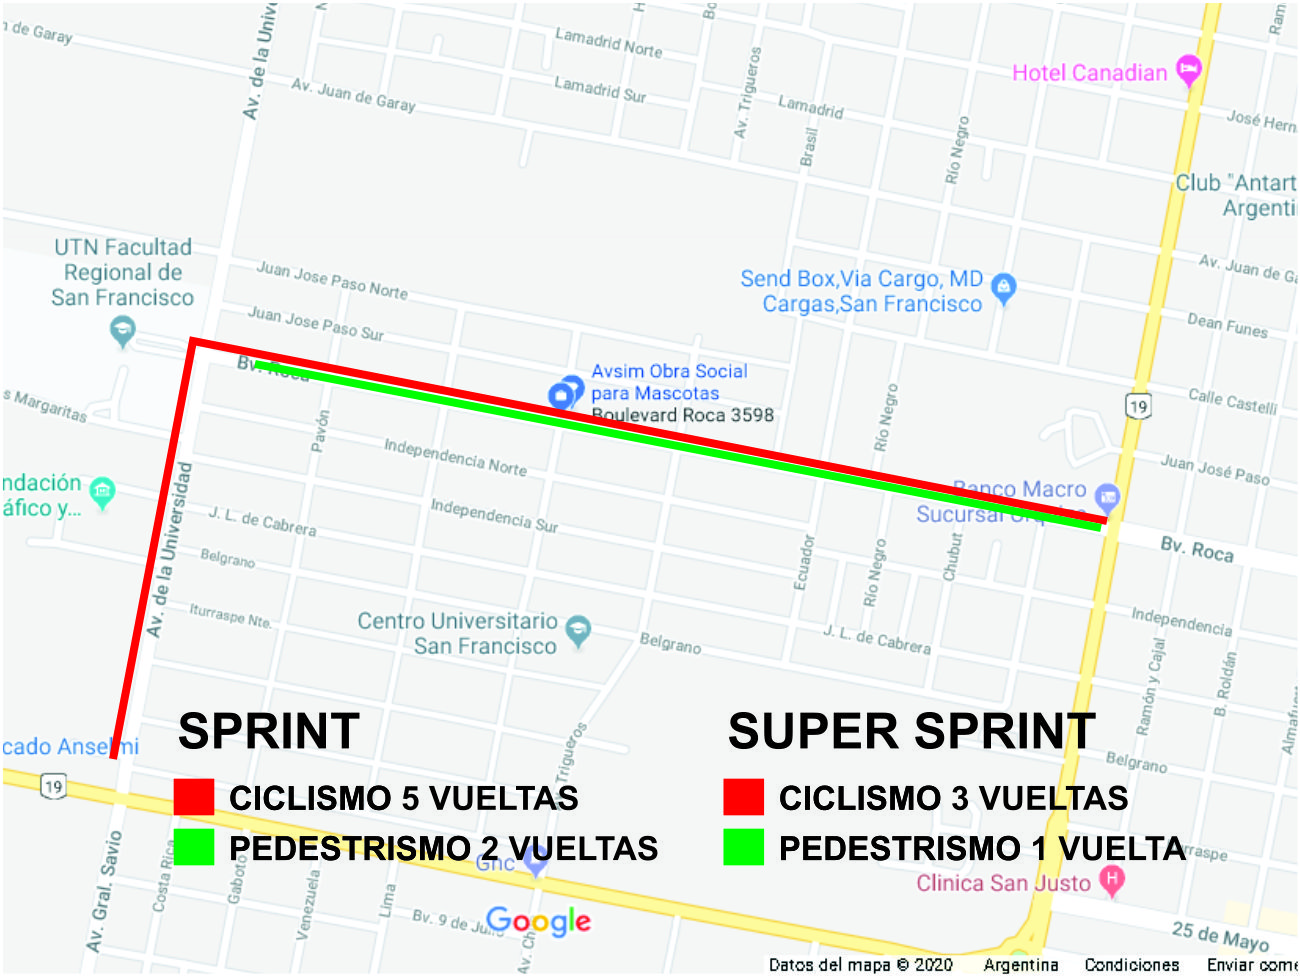 Circuito 3